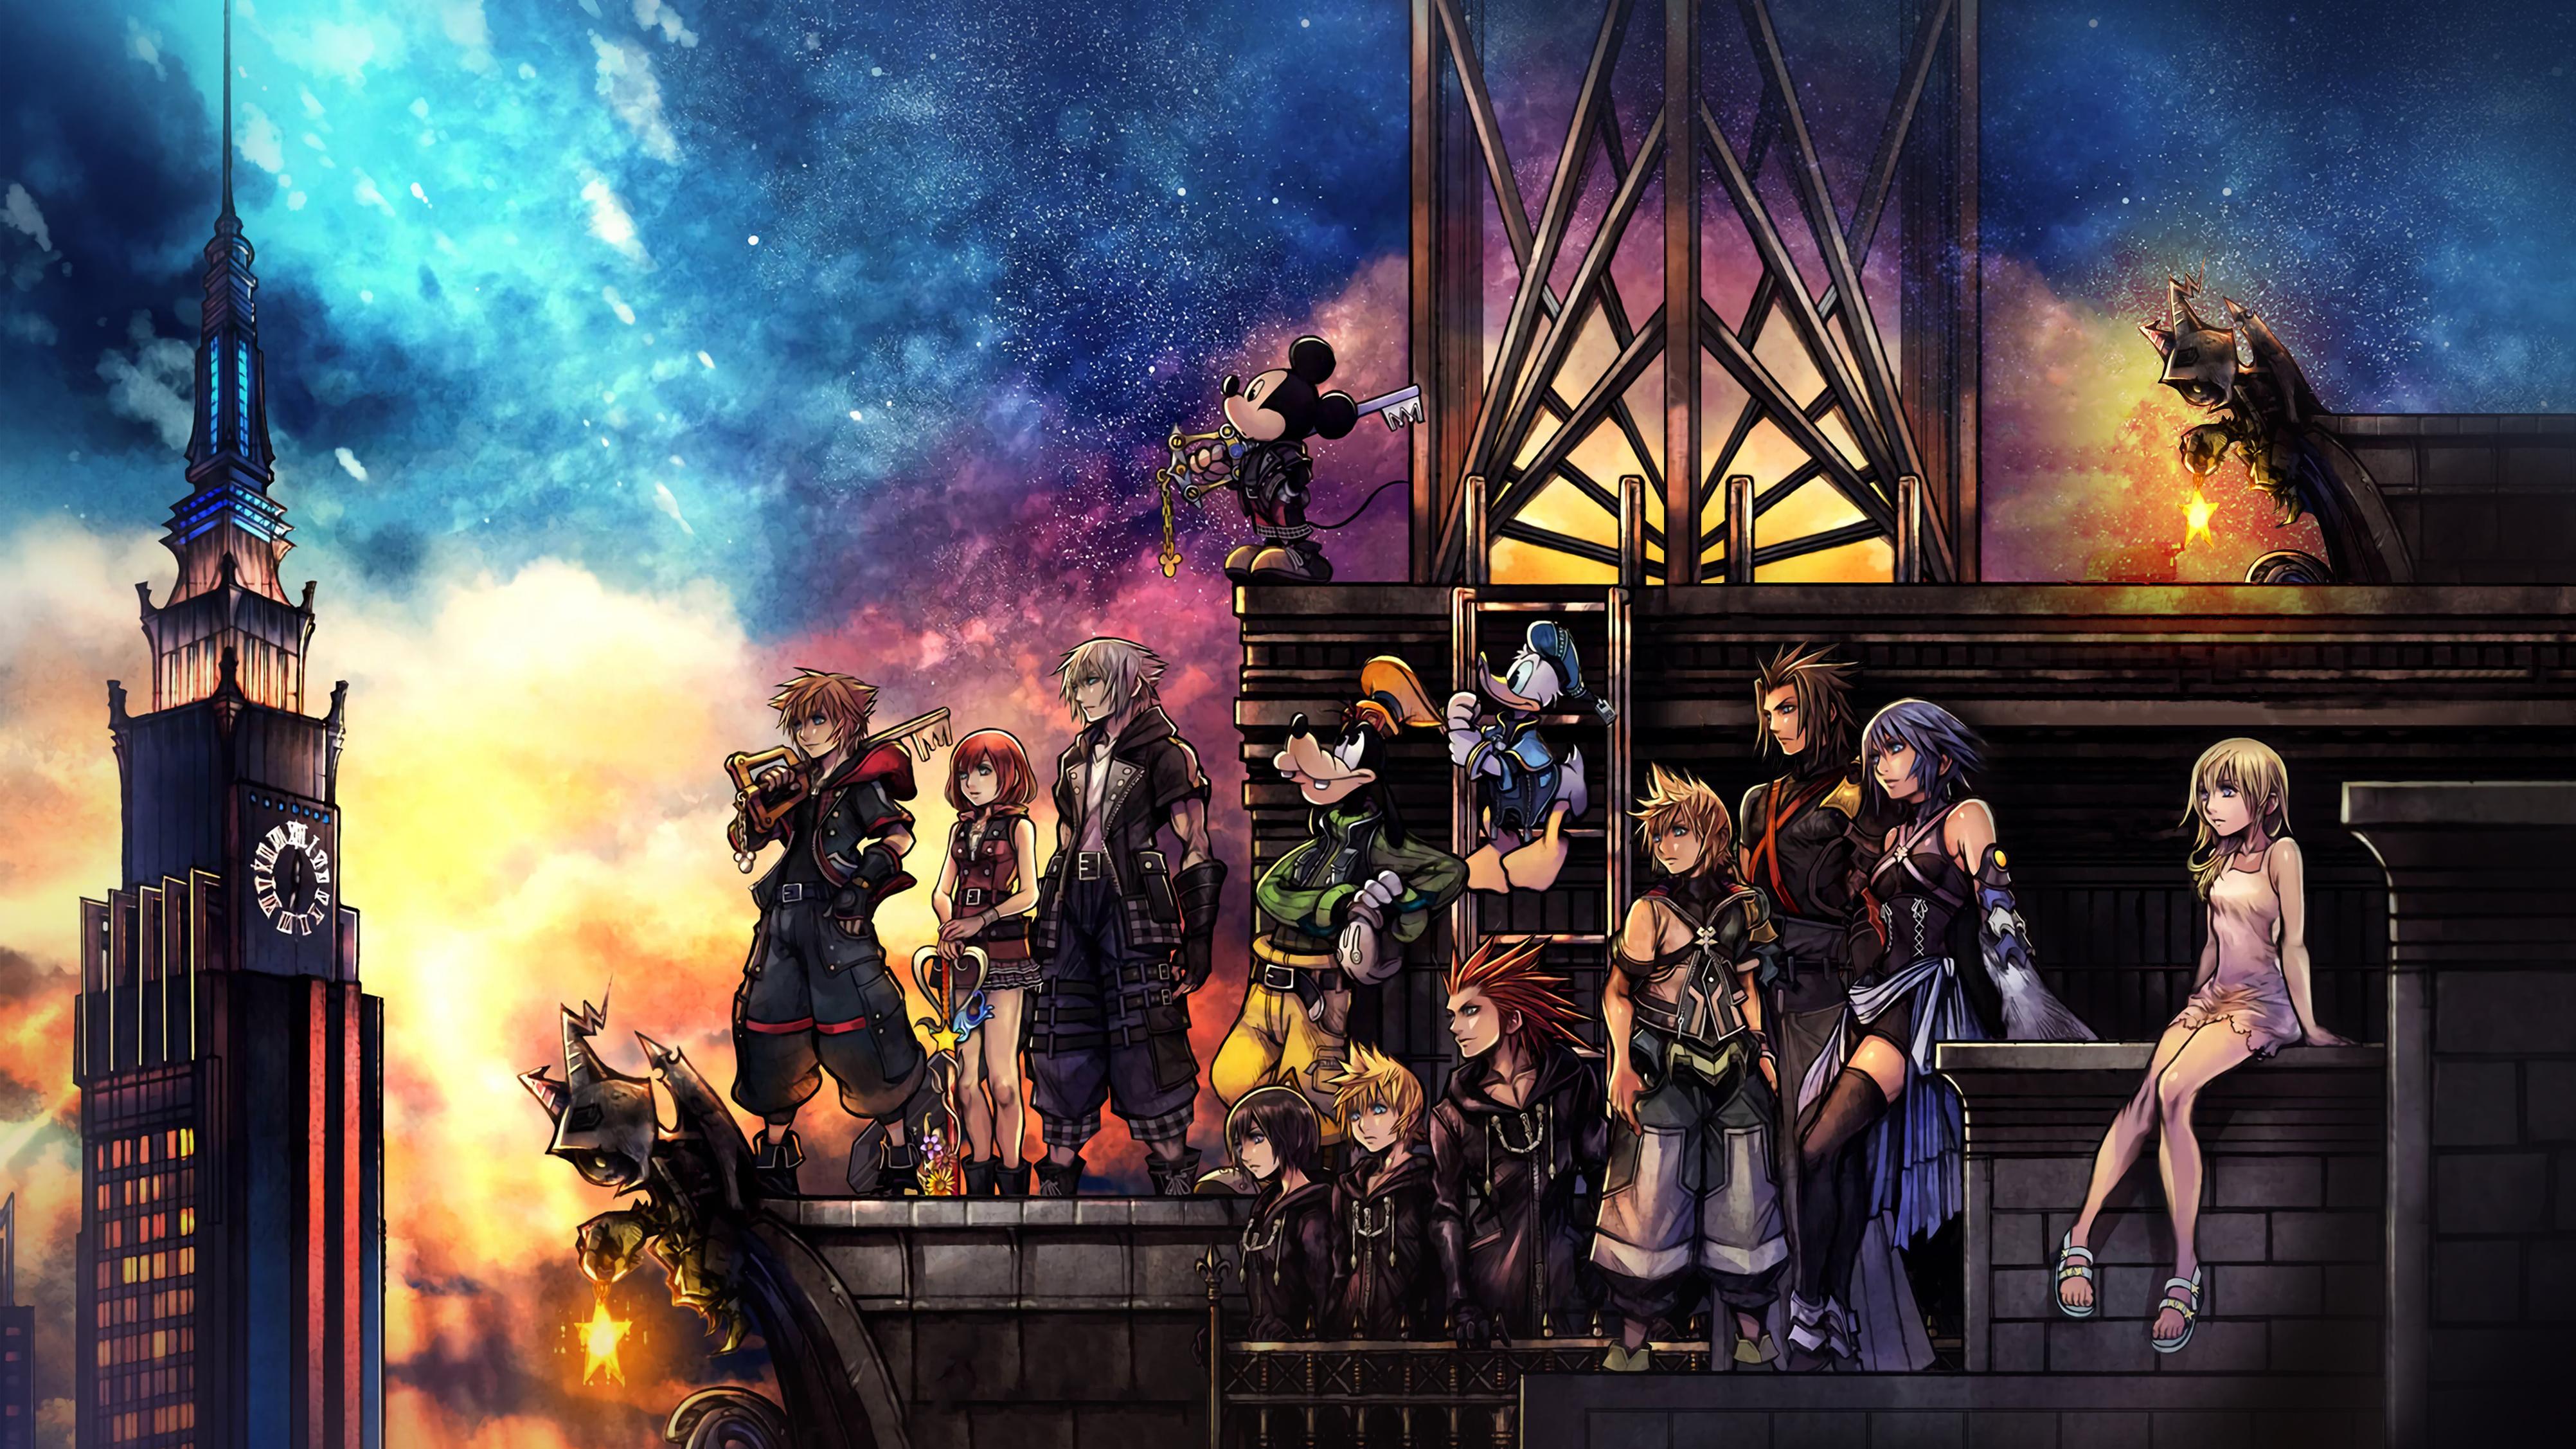 Kingdom Hearts Wallpaper (123 Wallpapers) - 3D Wallpapers